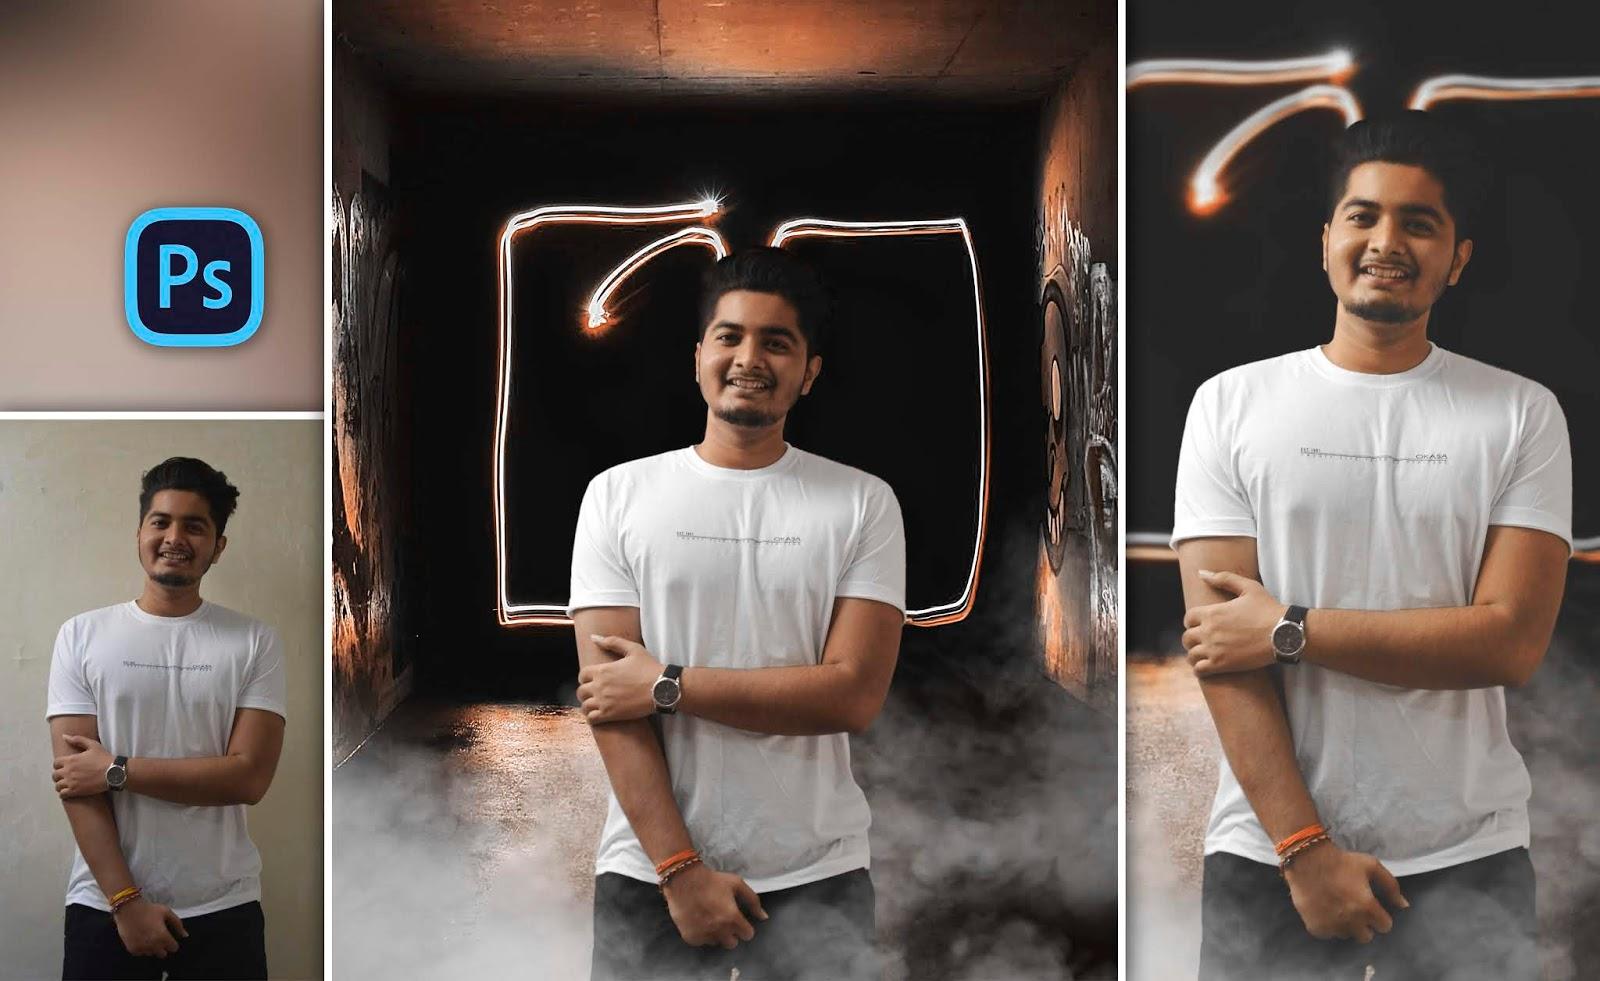 How to Create Neon Lights Photo Manipulation Like Danish Zehen in Photoshop cc